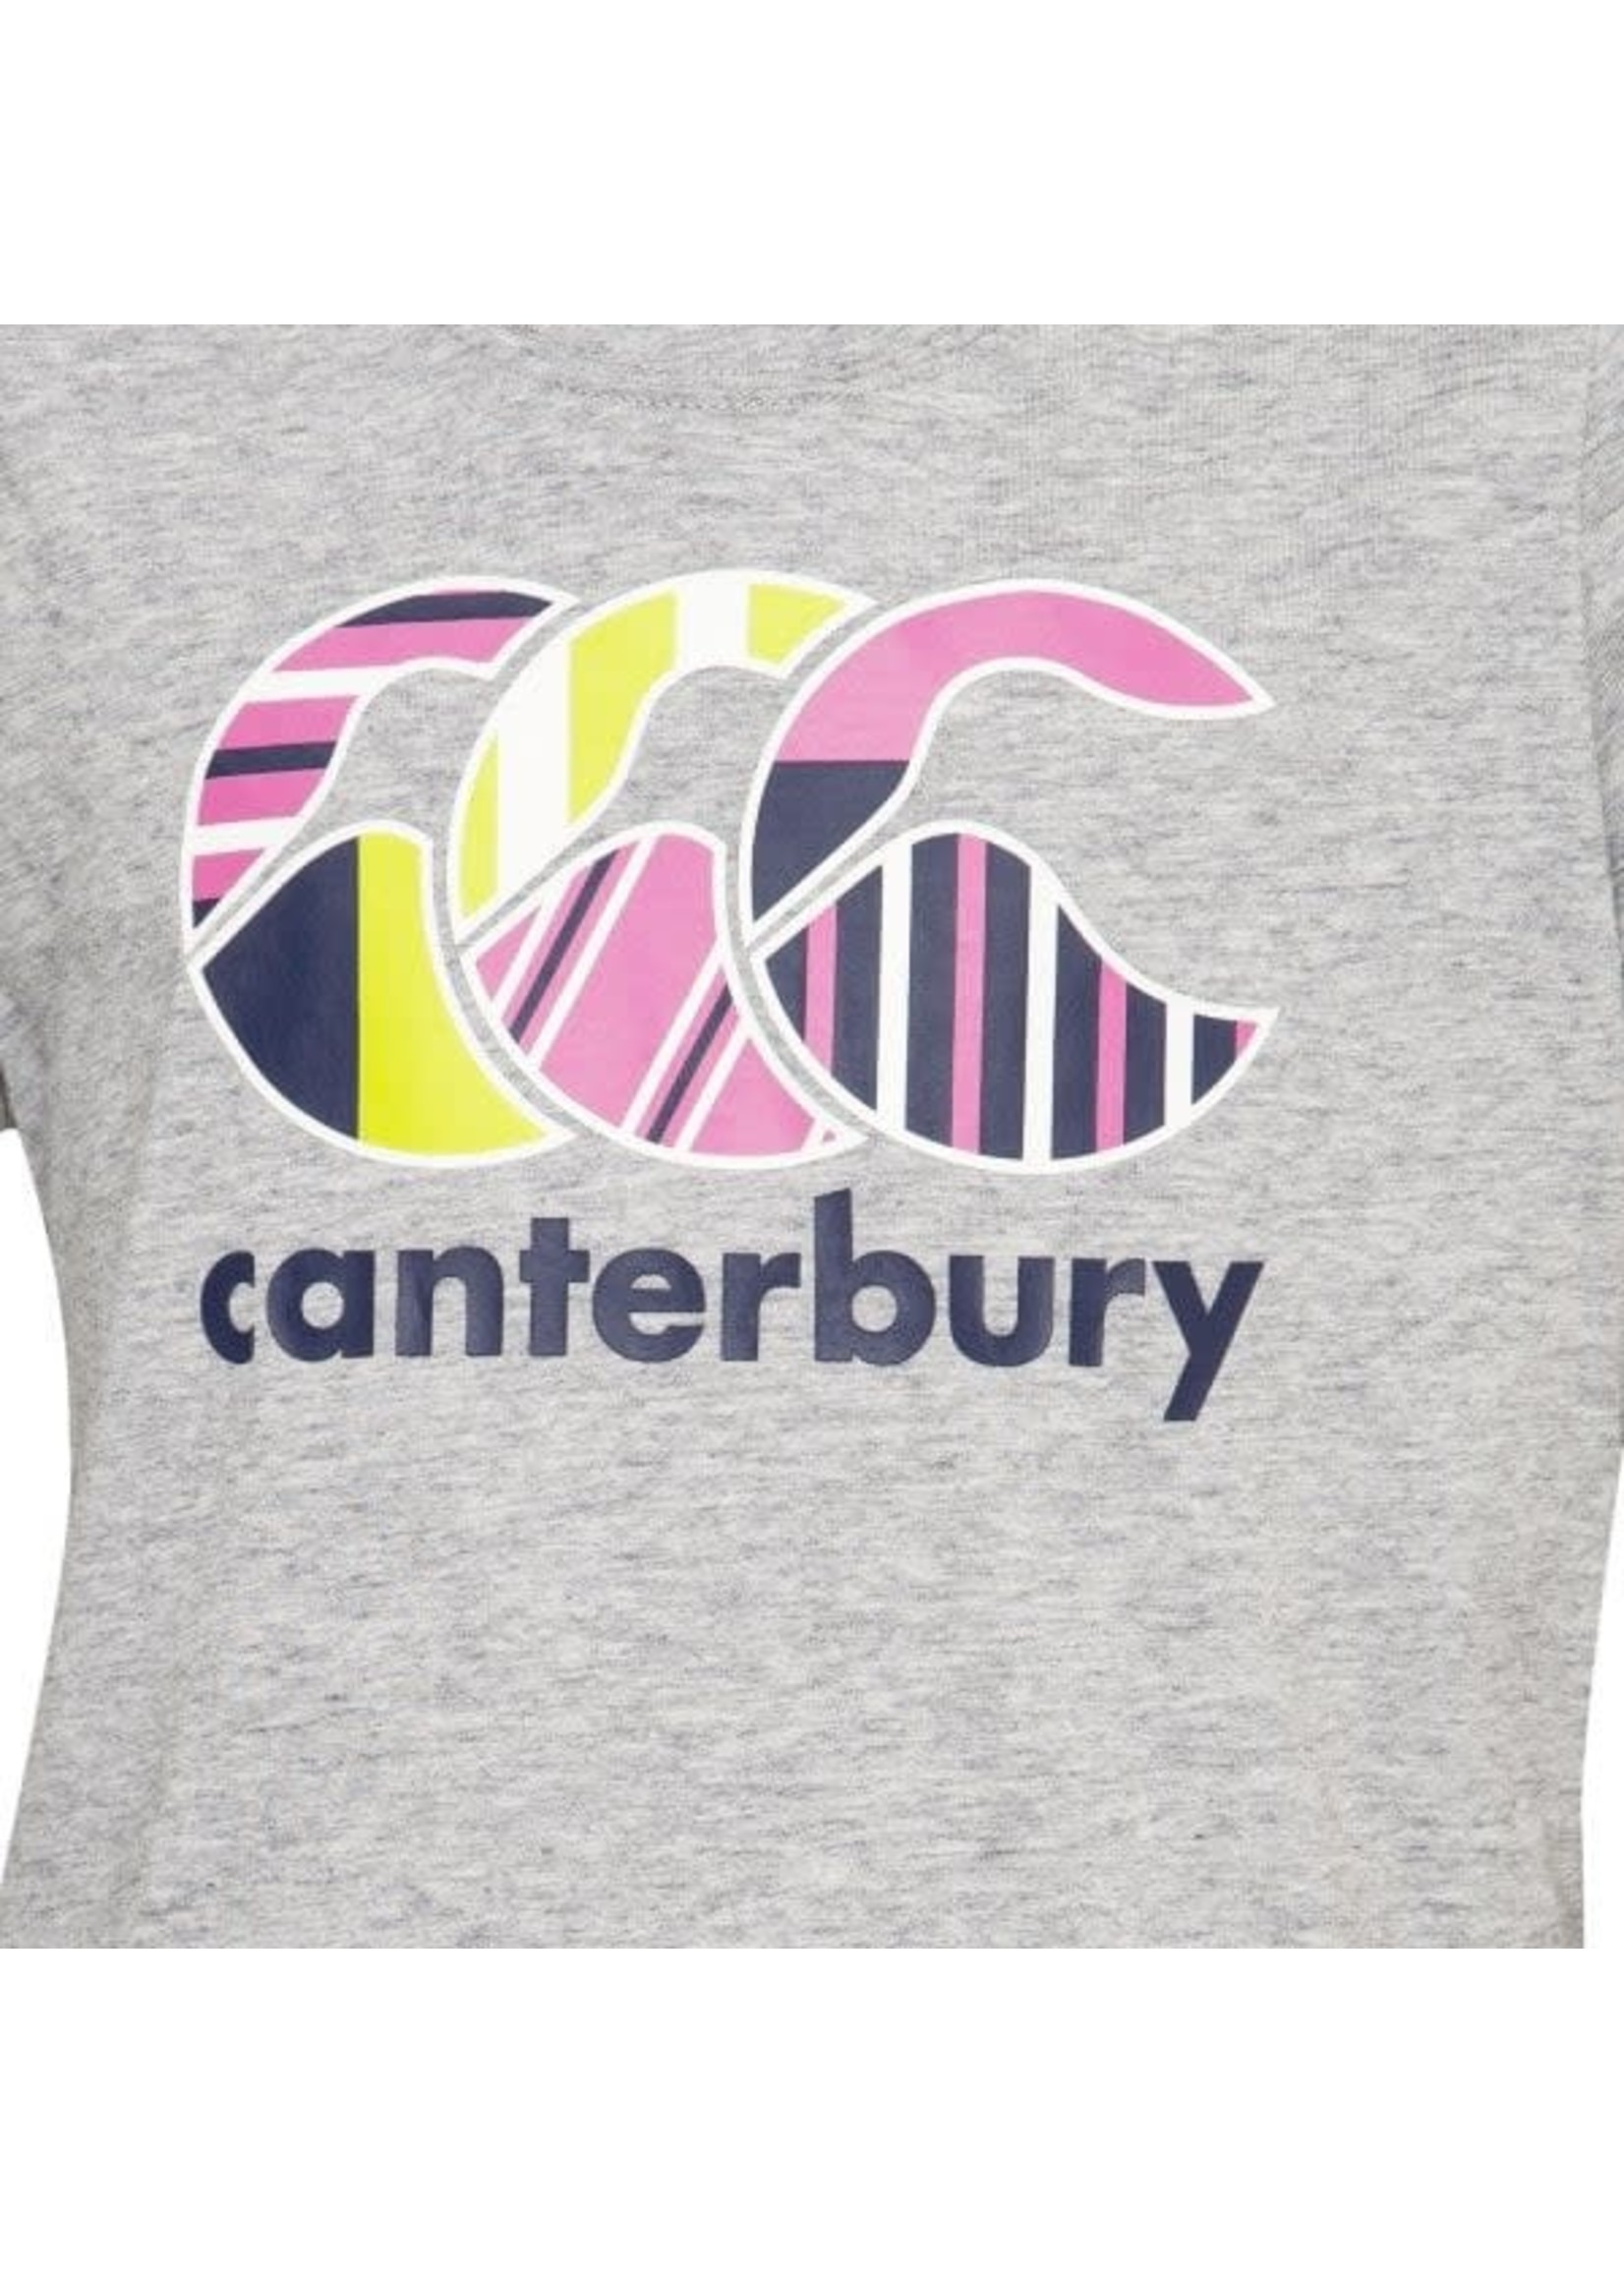 Canterbury Canterbury Girls Uglies Tee (2020/21), Grey/Pink/Navy/Lime